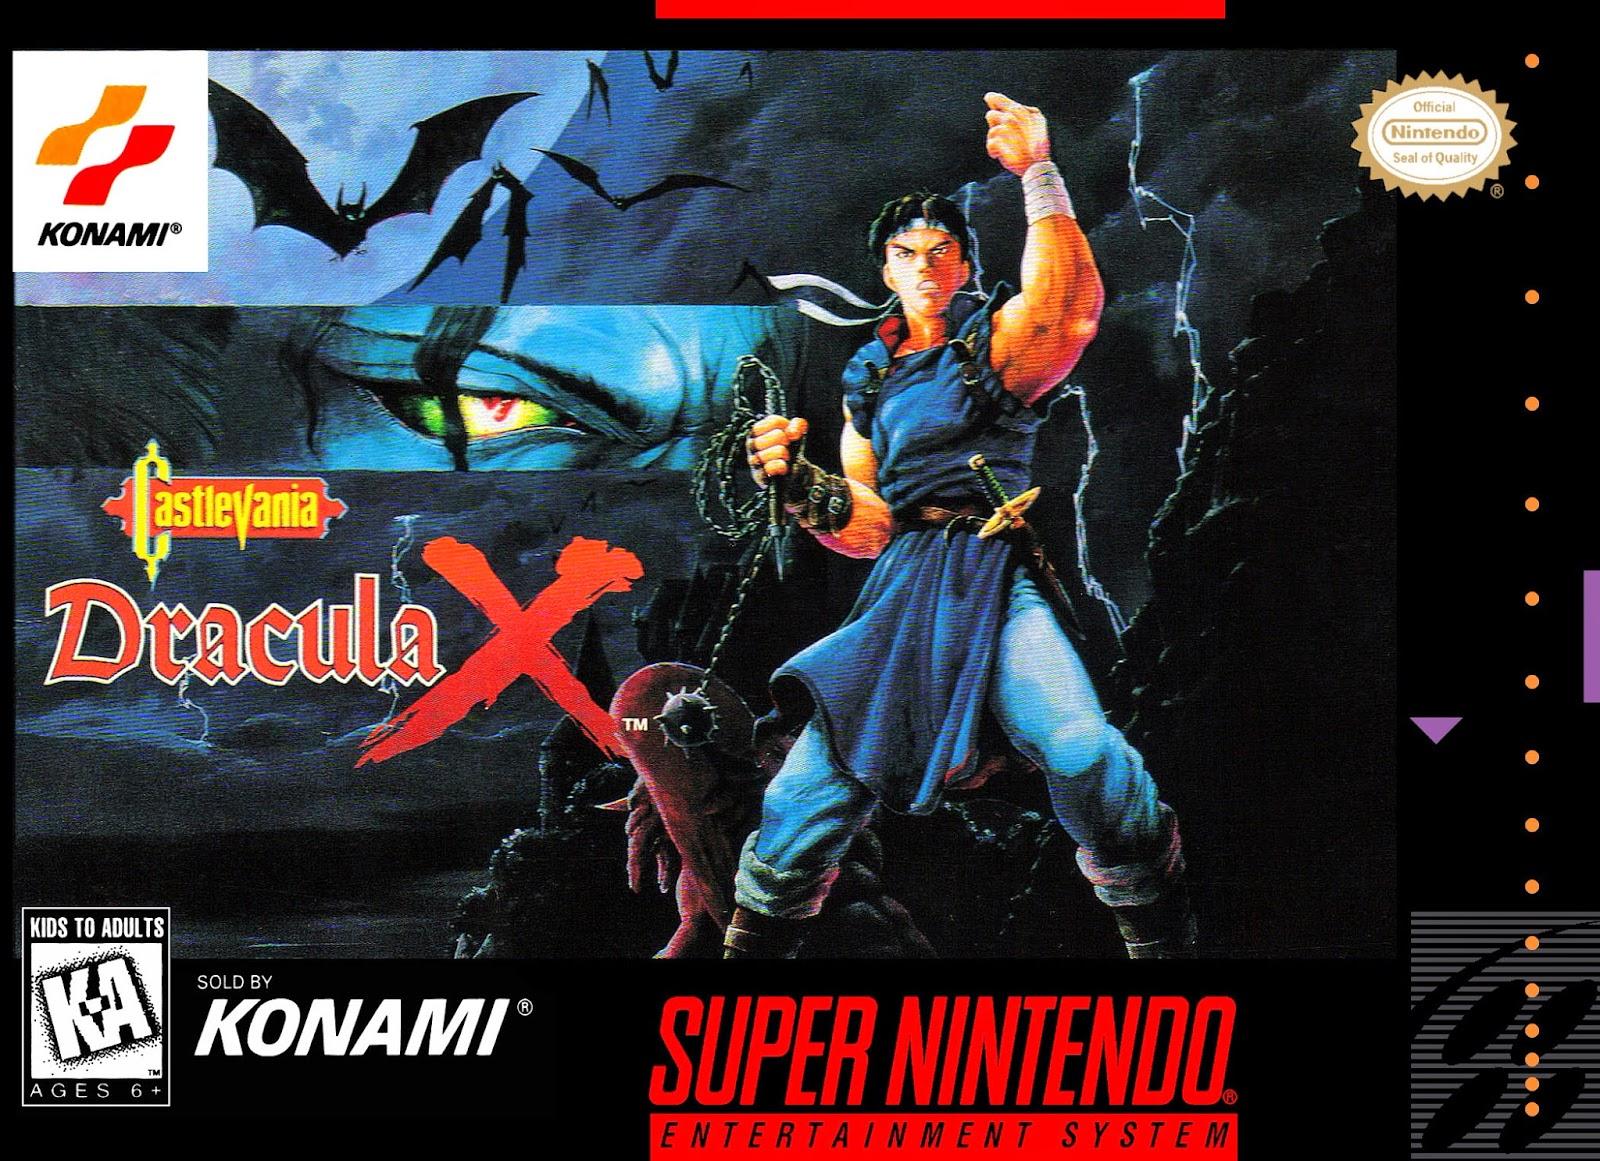 Castlevania Dracula X snes rom cover